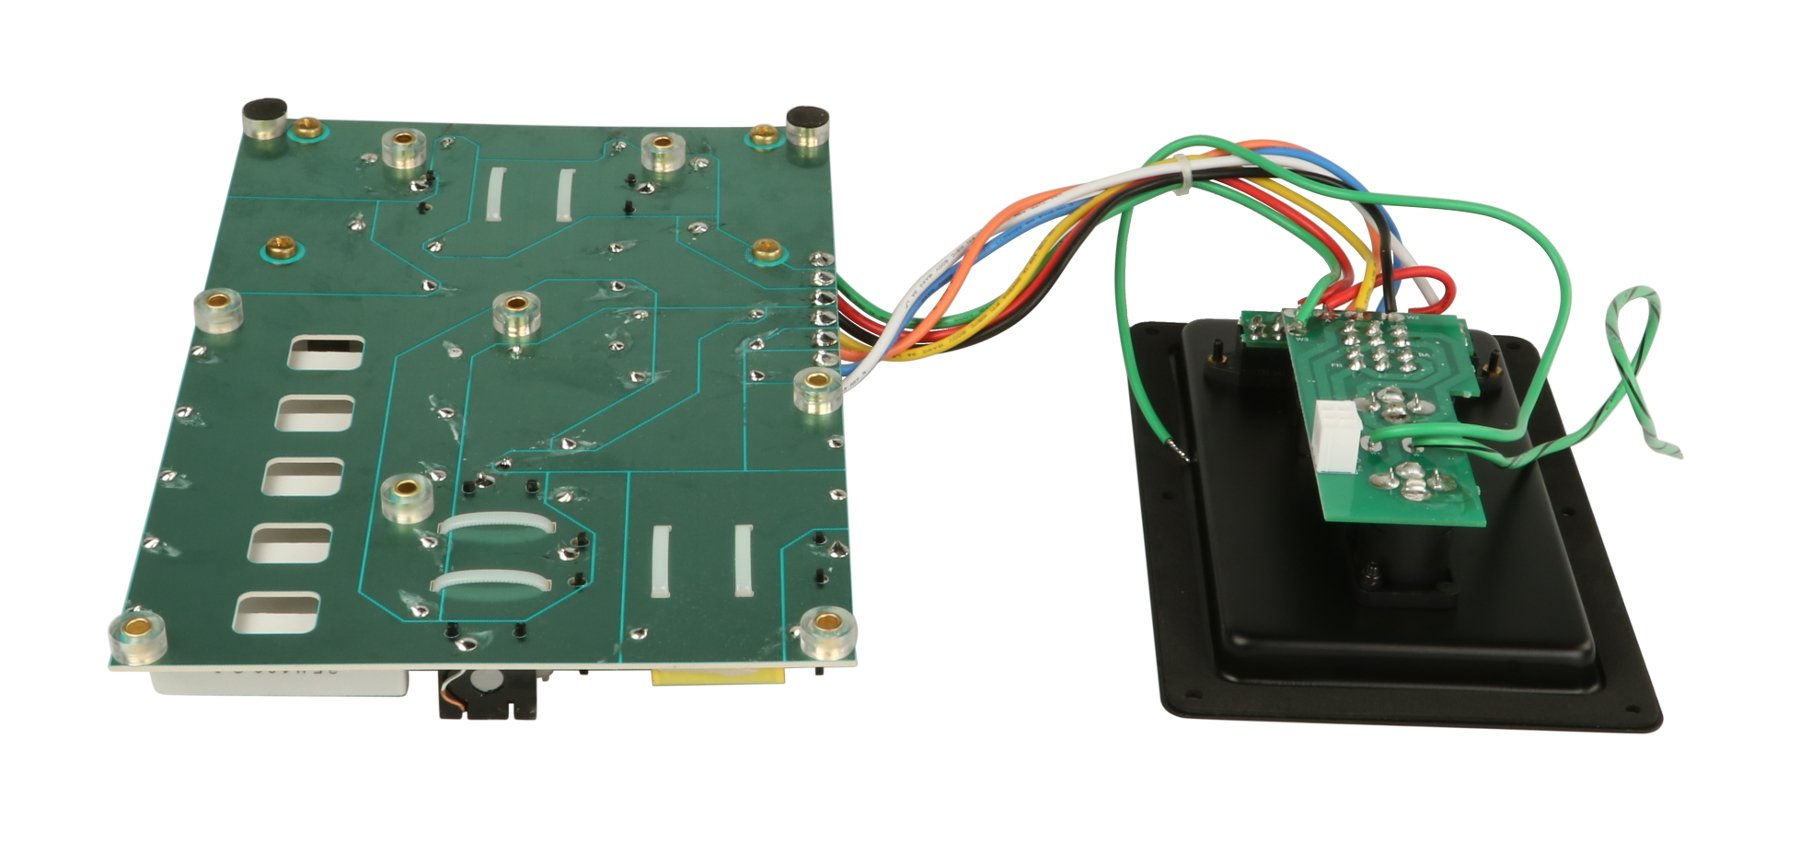 JBL 353556-006 Crossover Network For VRX932 | Full Comp ... on